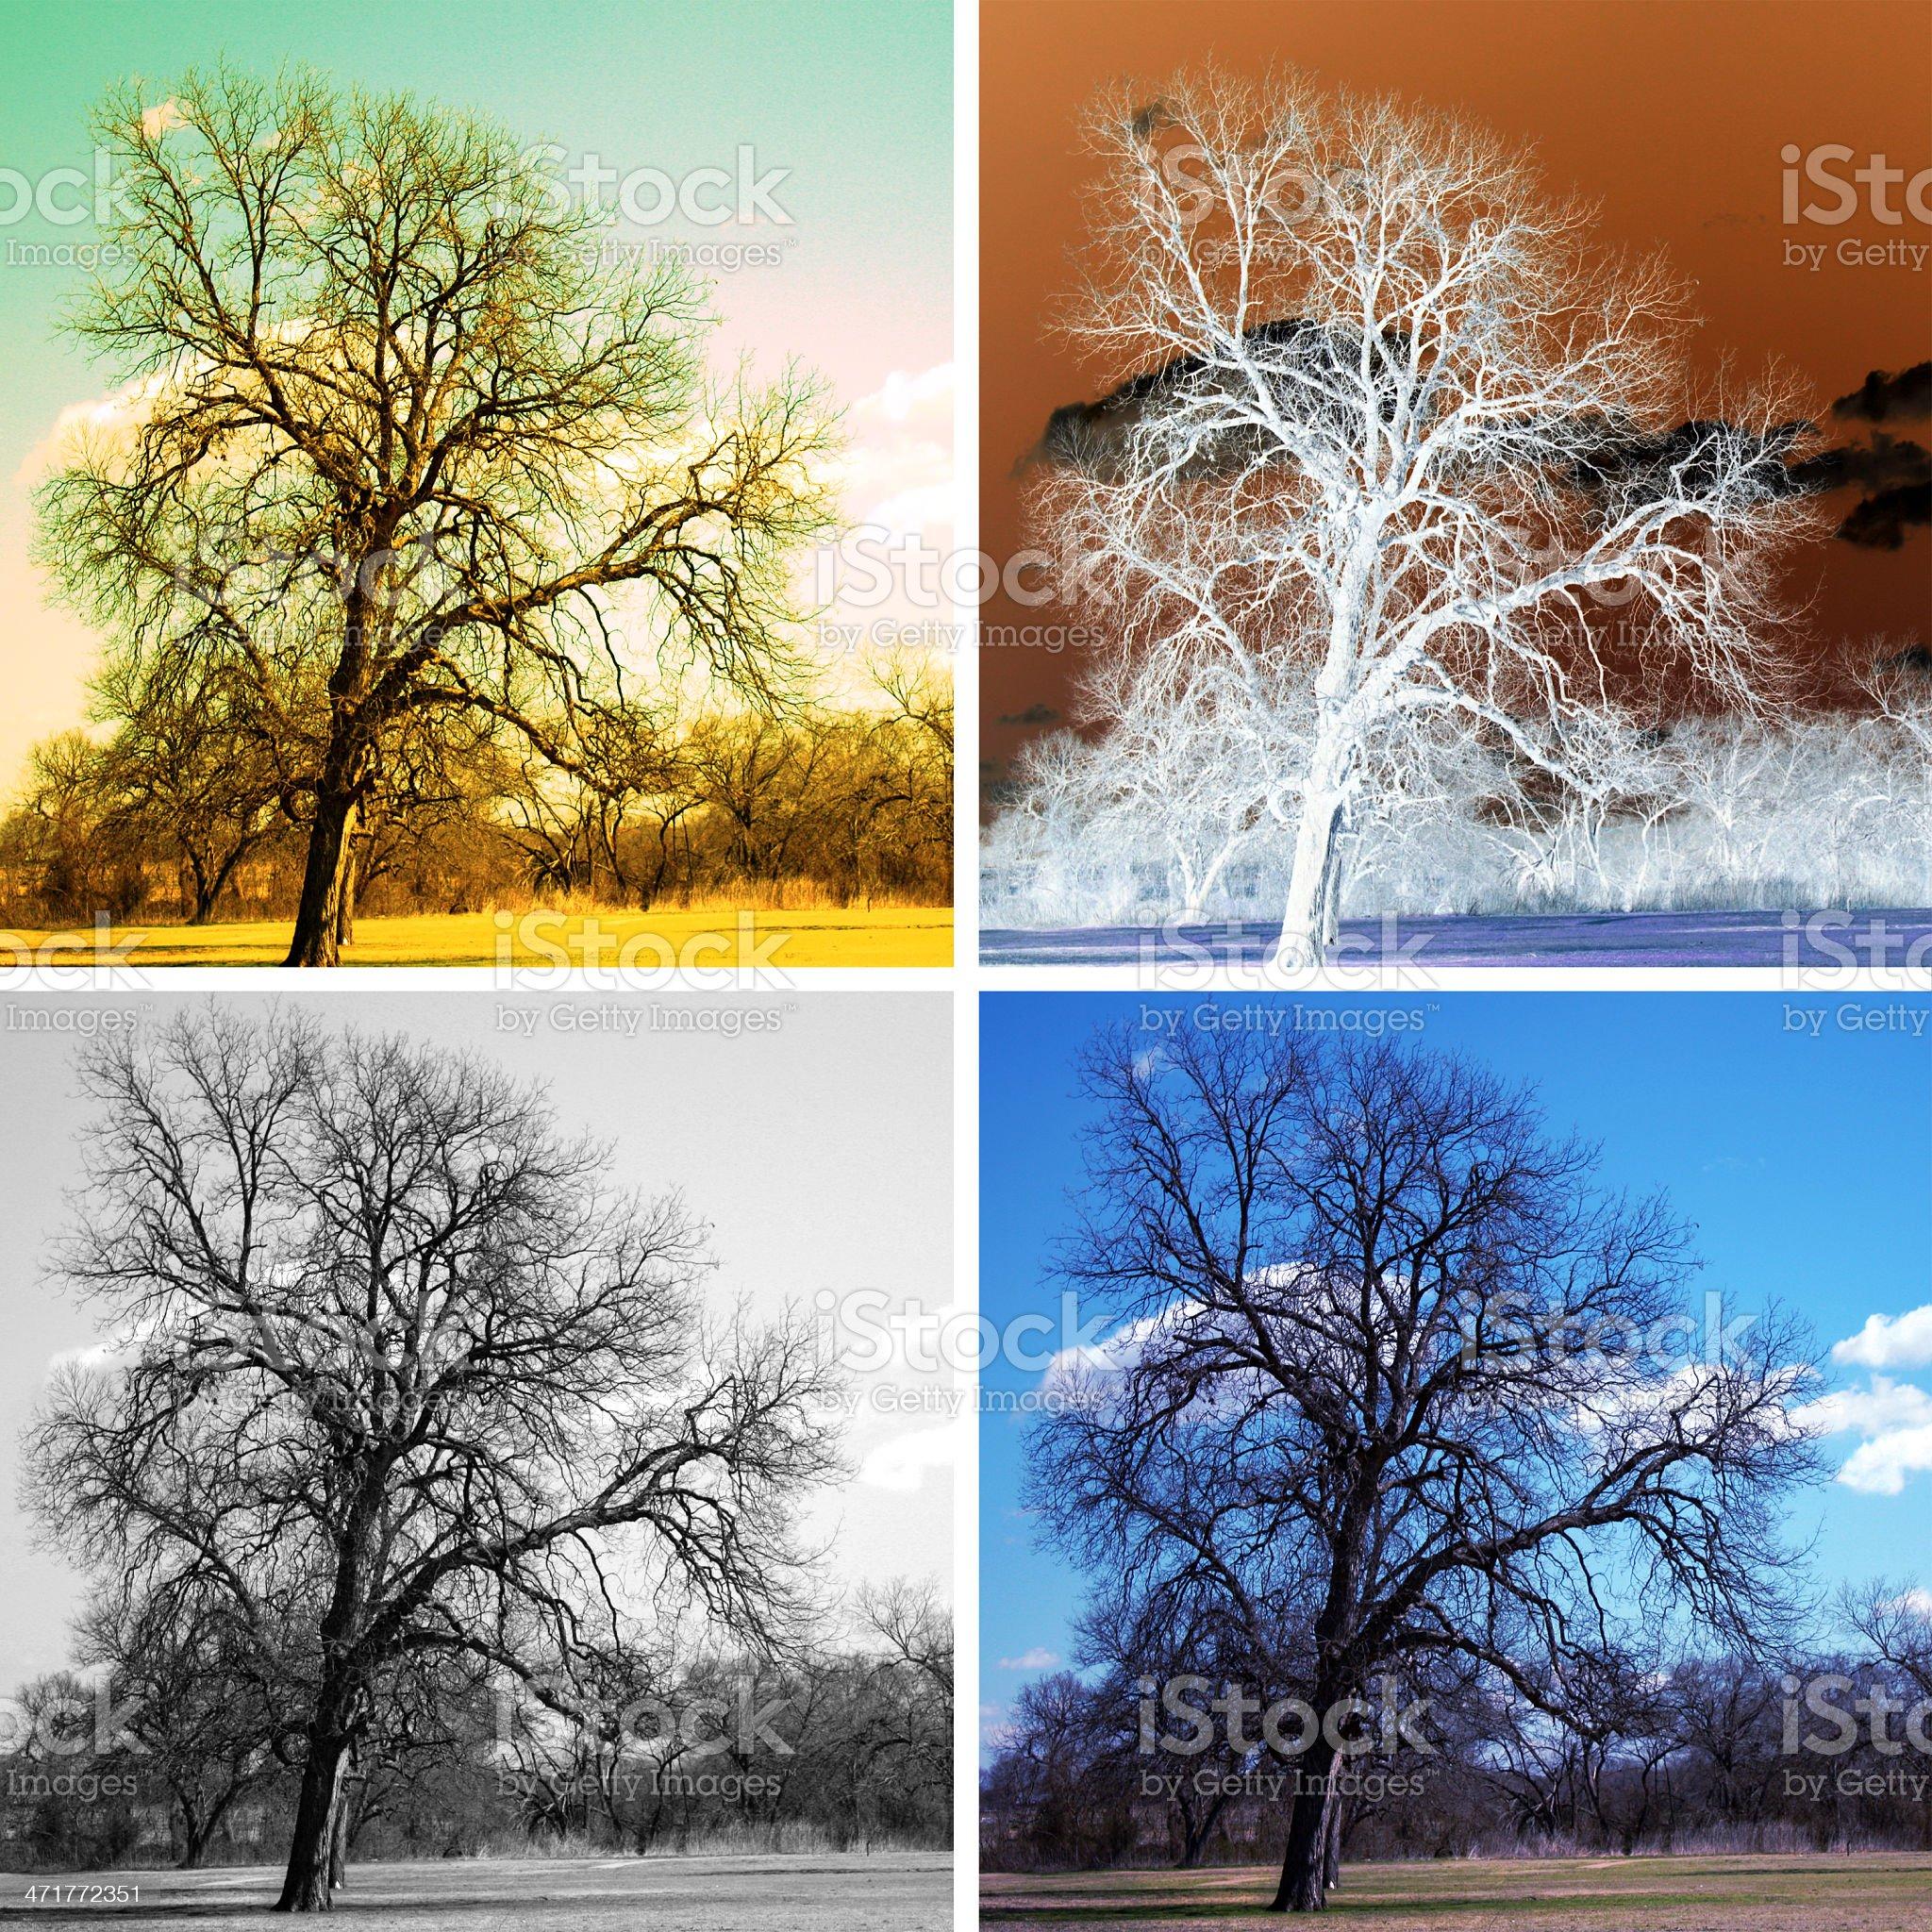 trees in season royalty-free stock vector art